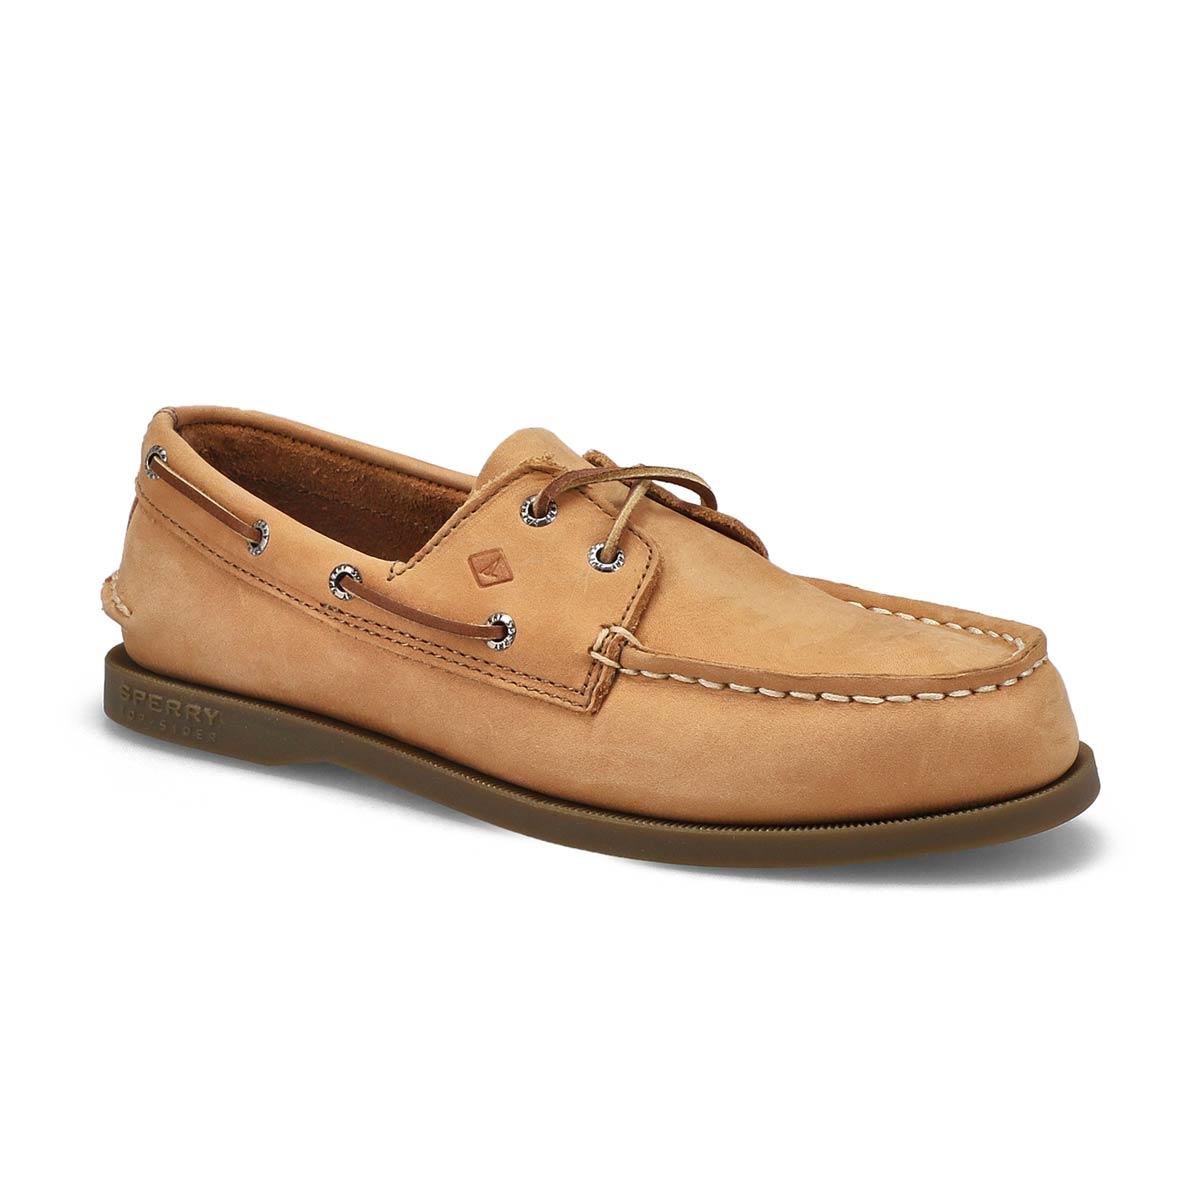 Chaussure bateau A/O, nubucksahara, garç